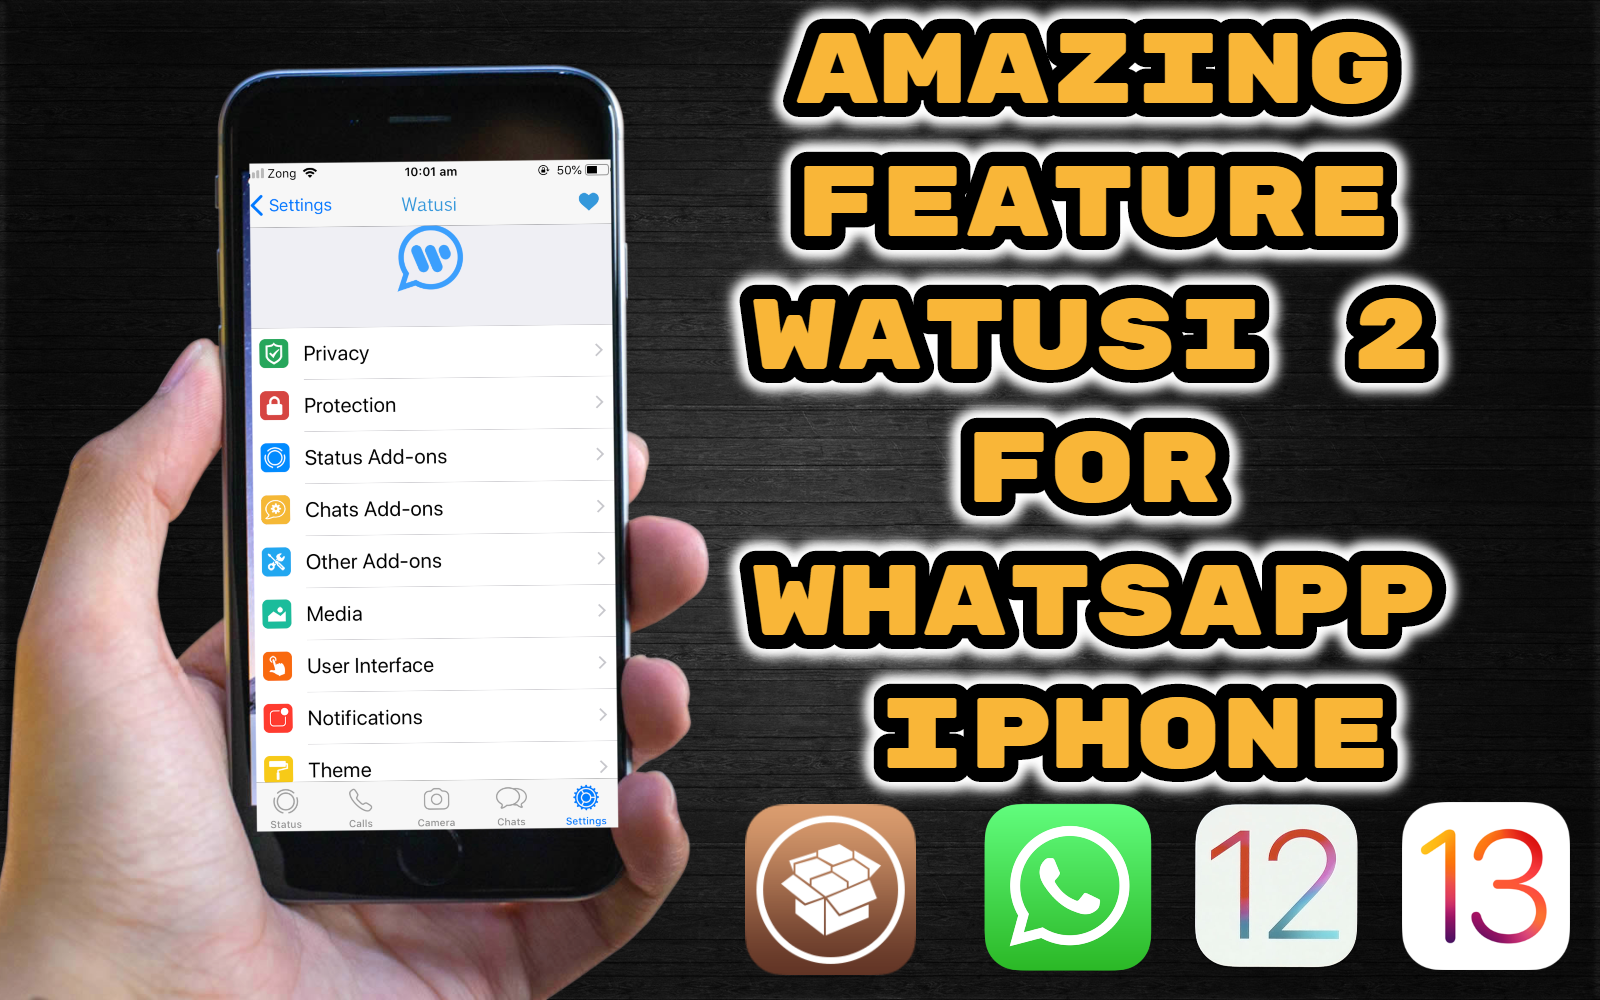 Whatsappp New Feature For Iphone Ipad 2019 Watusi 2 For Whatsapp With Jailbreak Ios 12 1 4 Ios 12 4 Iphone App Badges Ipad